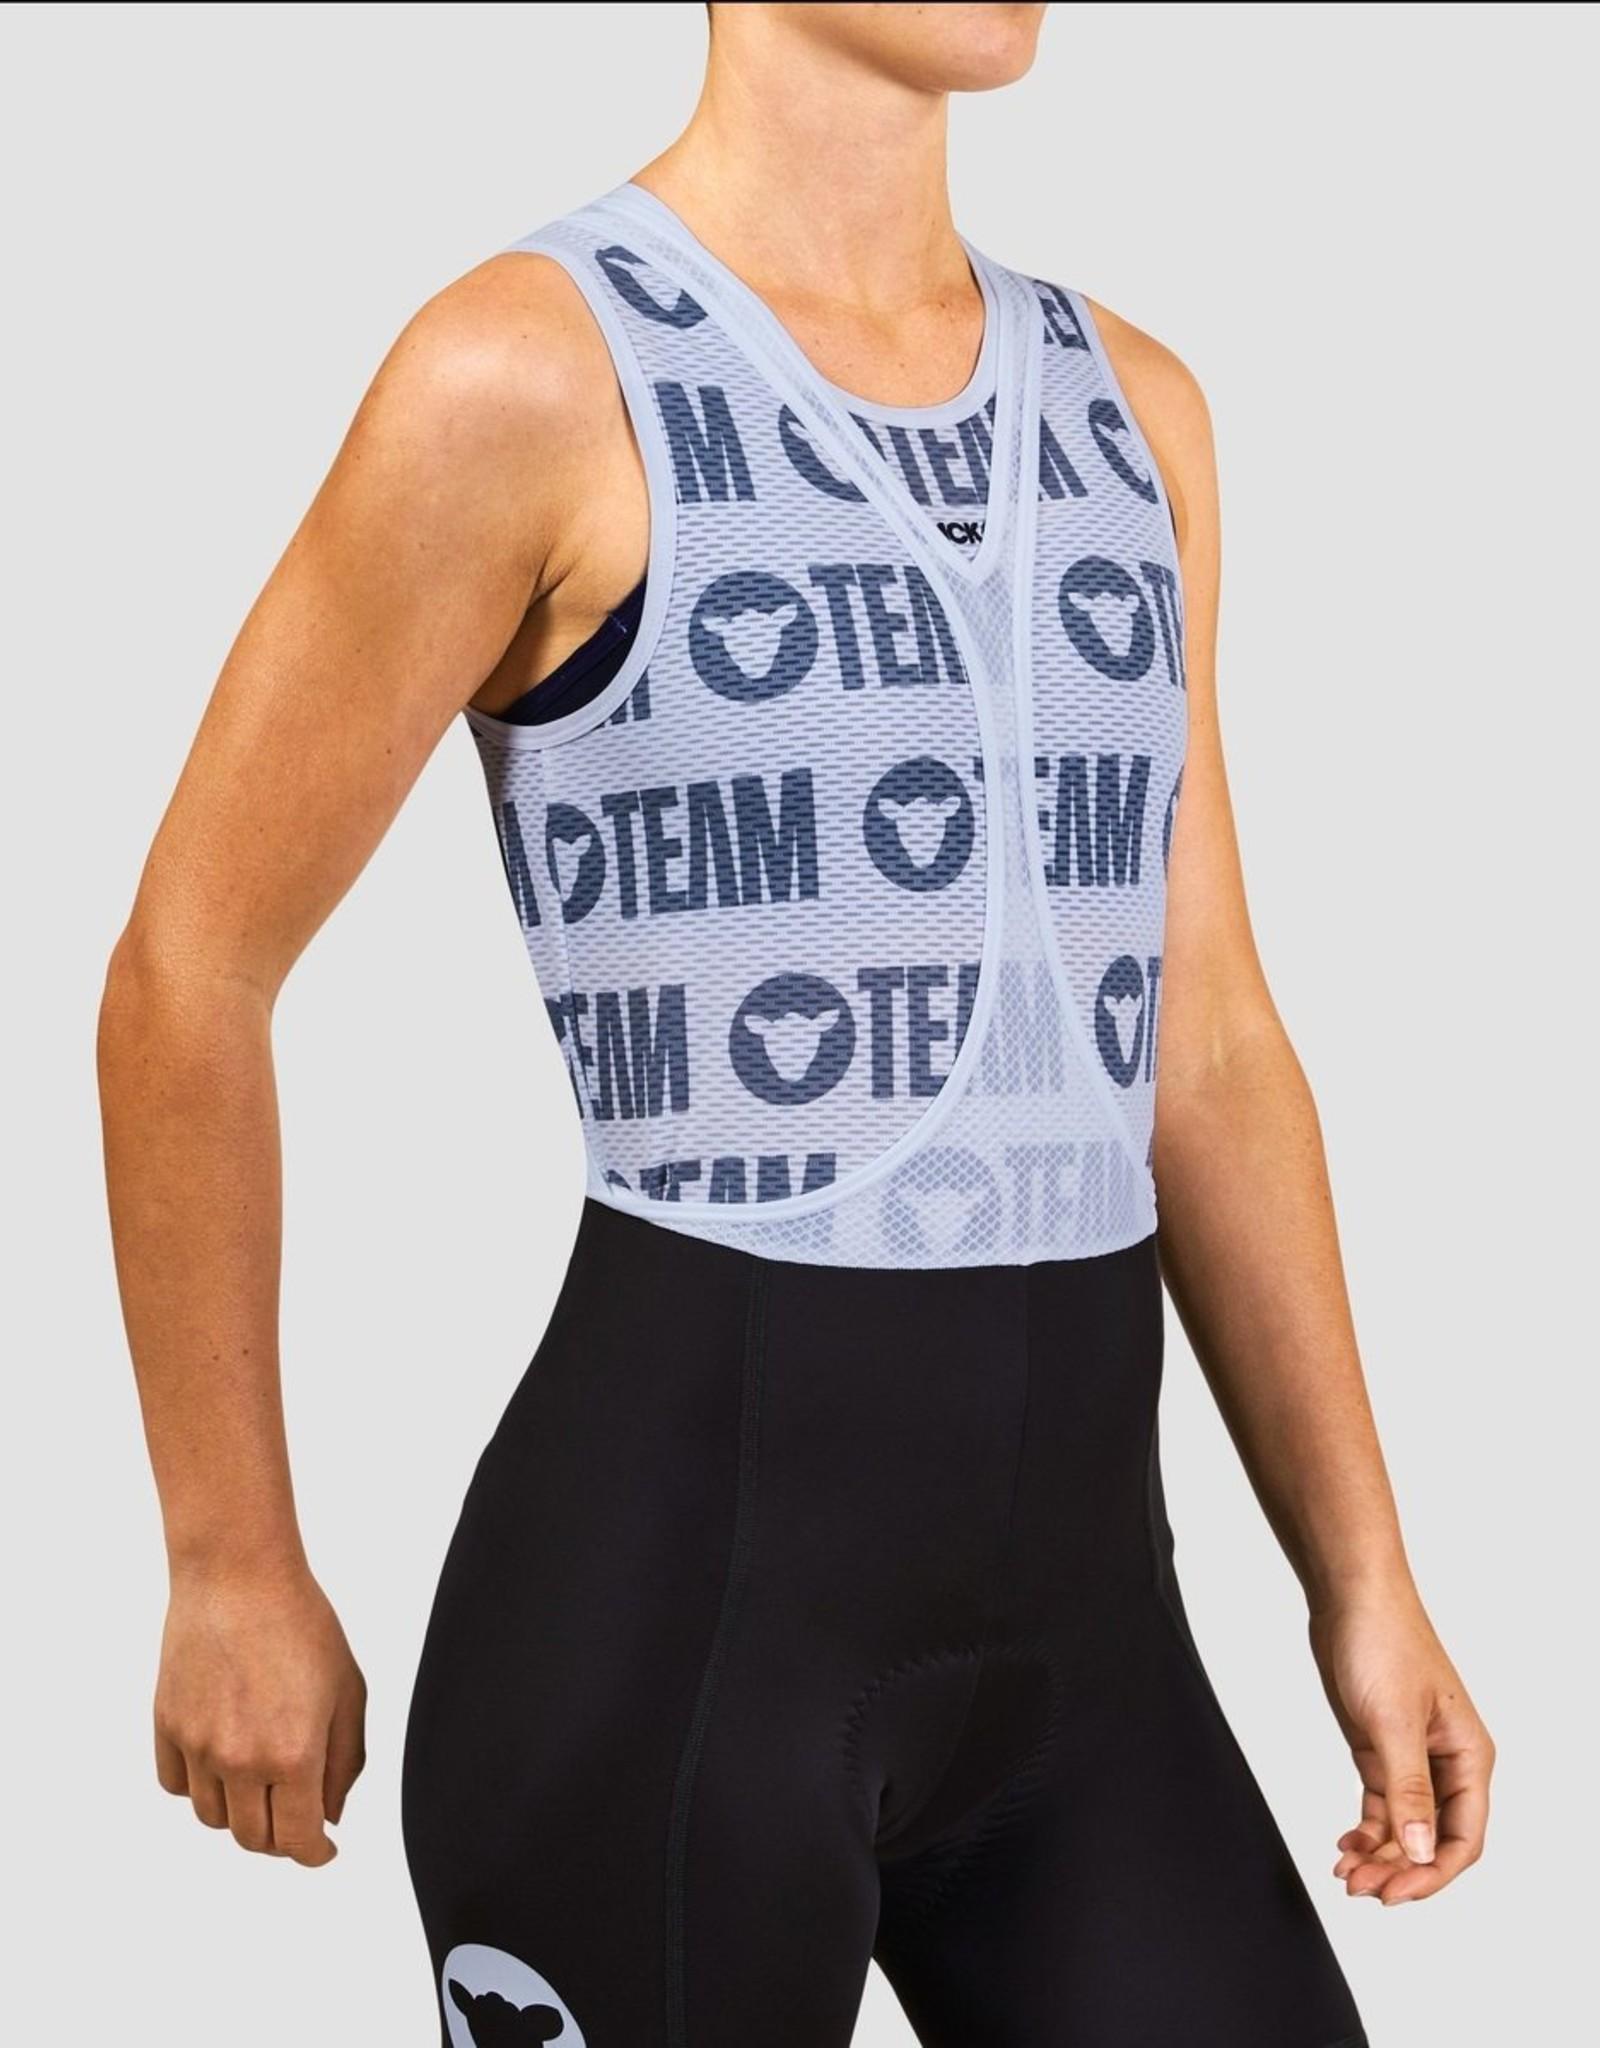 Black Sheep Cycling Women's Essentials TEAM Ugarment - White